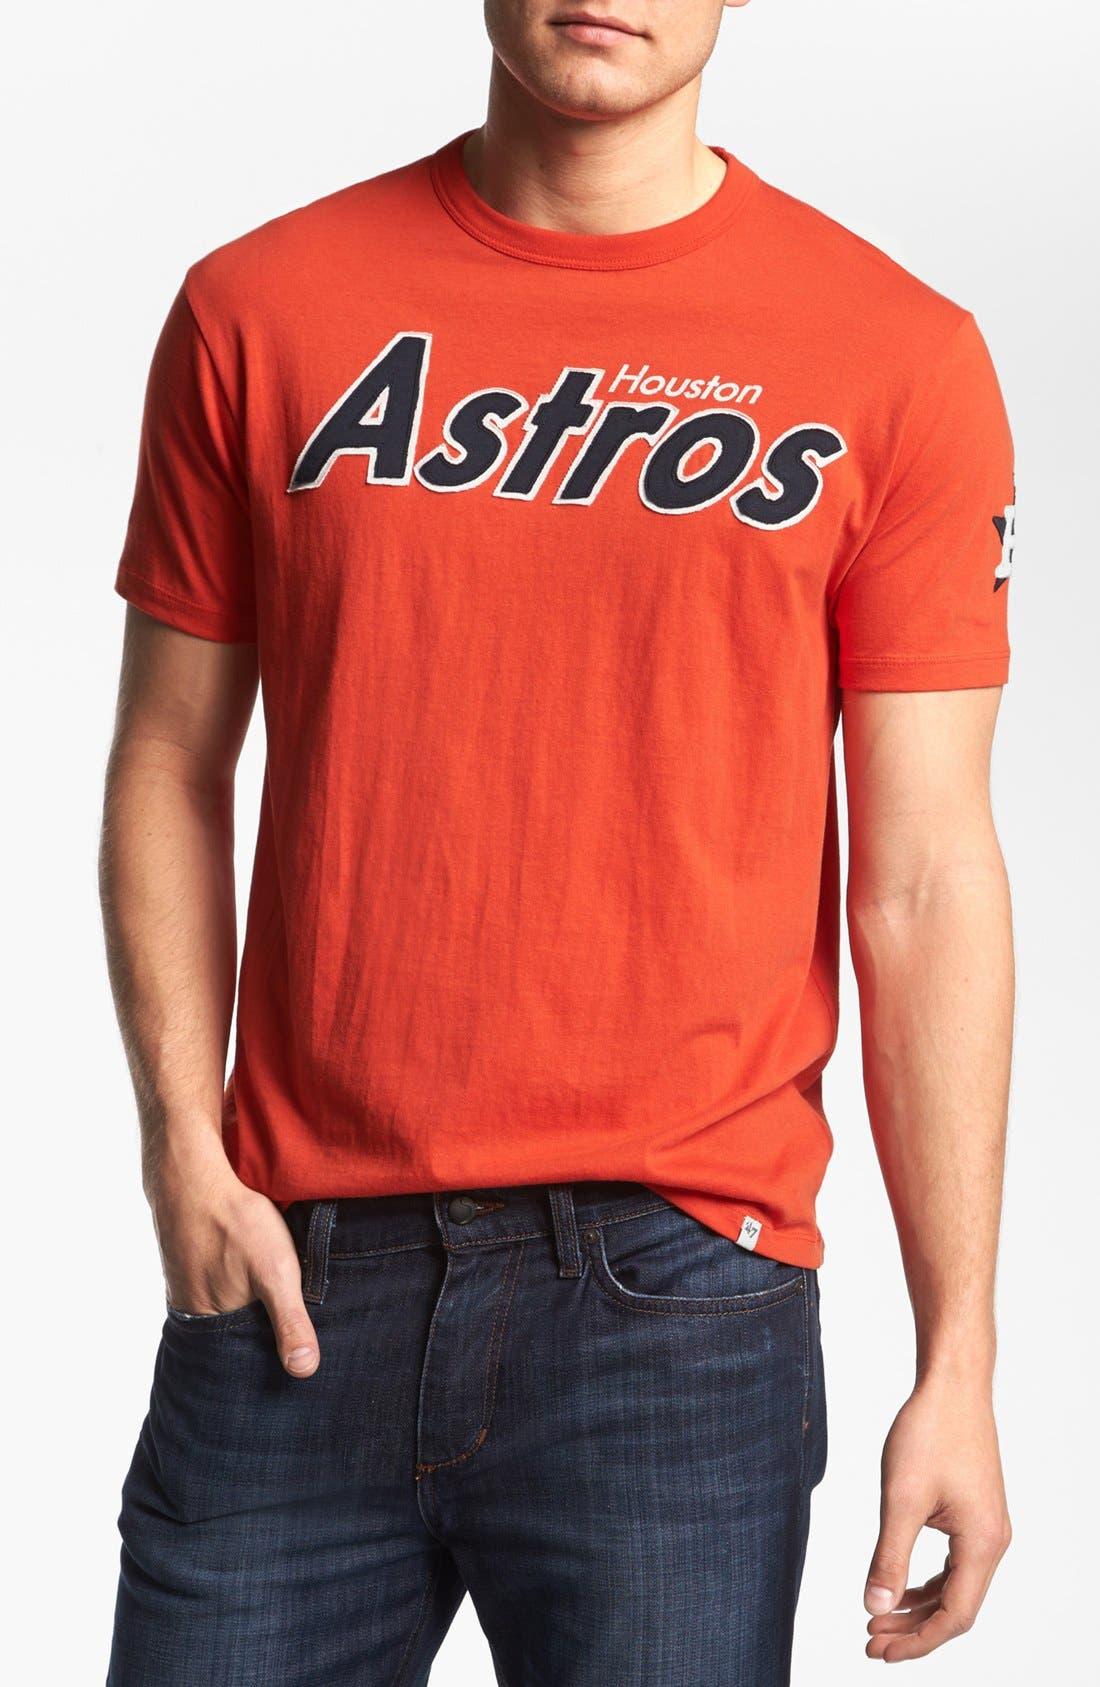 Alternate Image 1 Selected - 47 Brand 'Houston Astros - Fieldhouse' T-Shirt